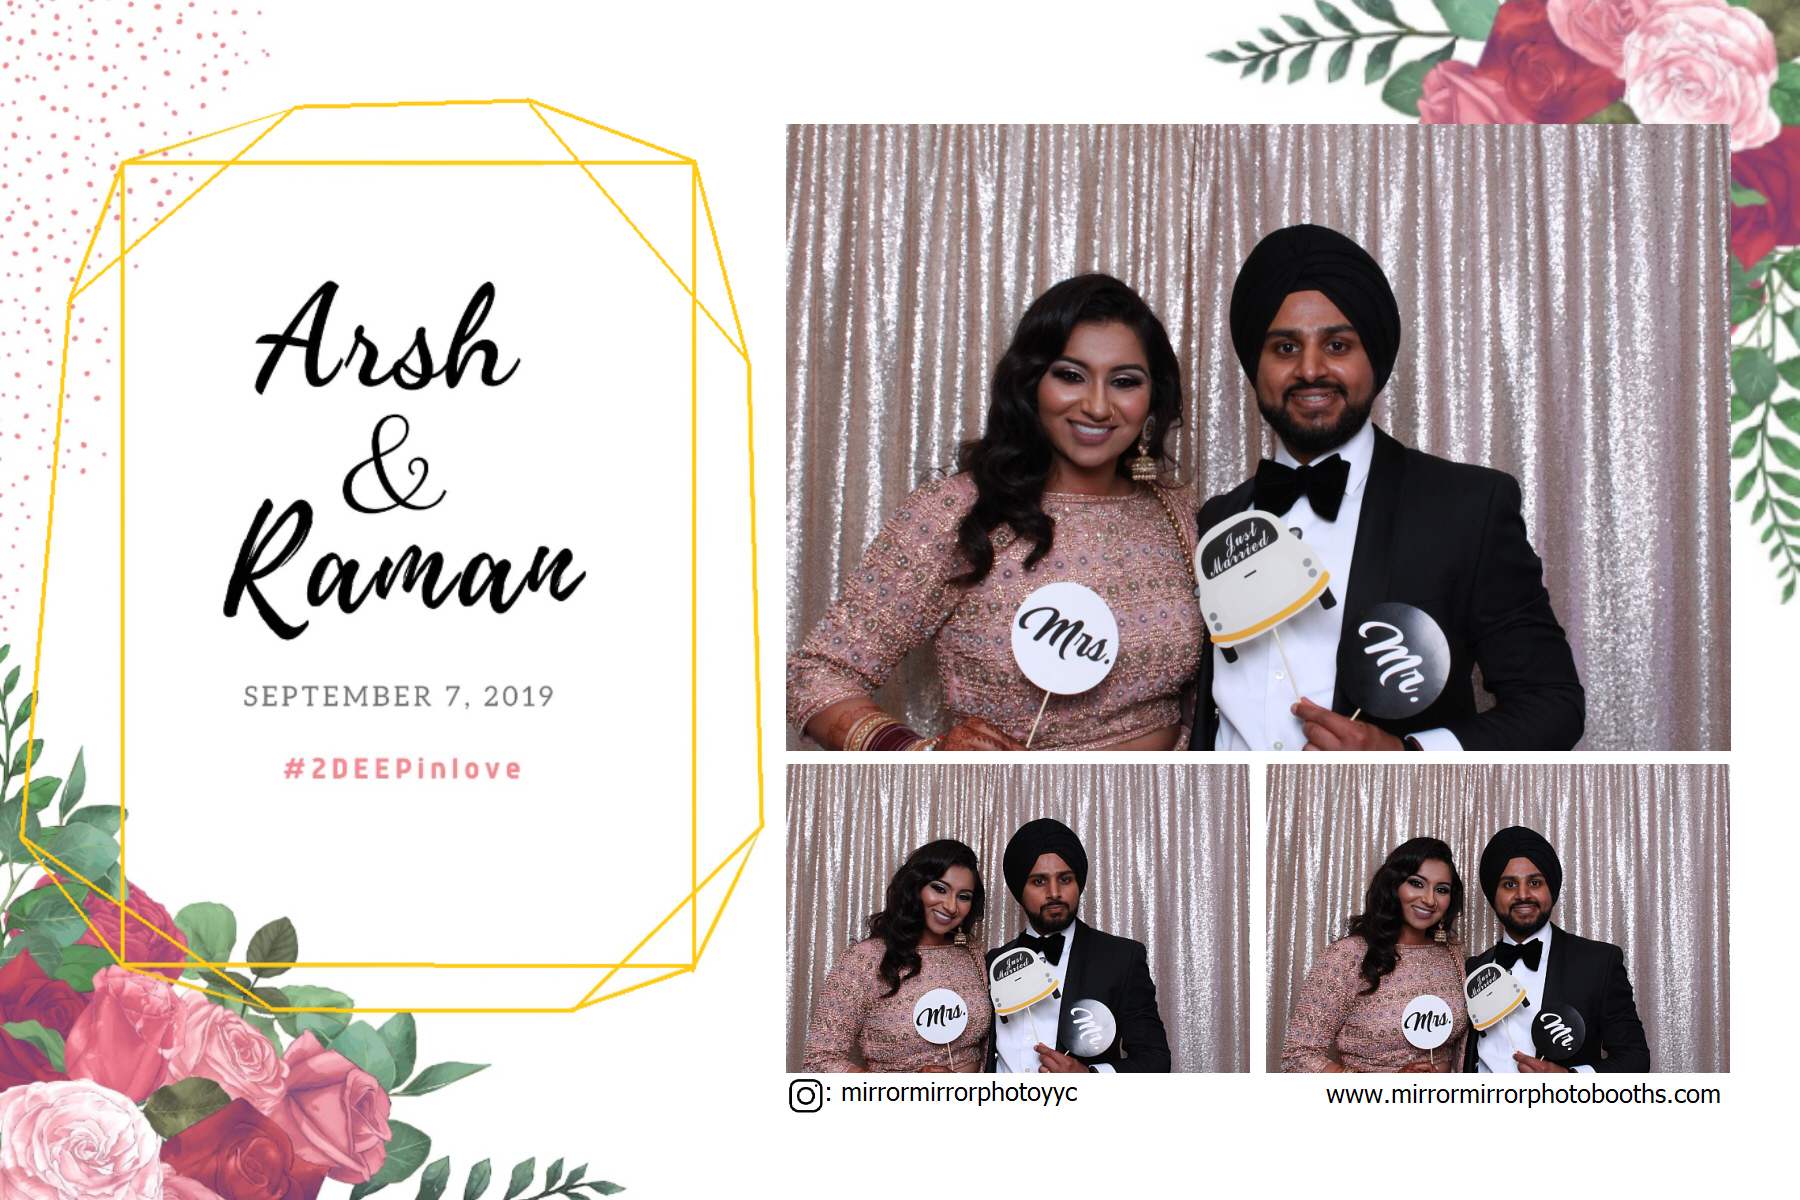 Sep 7, 2019 - Arsh & Raman's Wedding